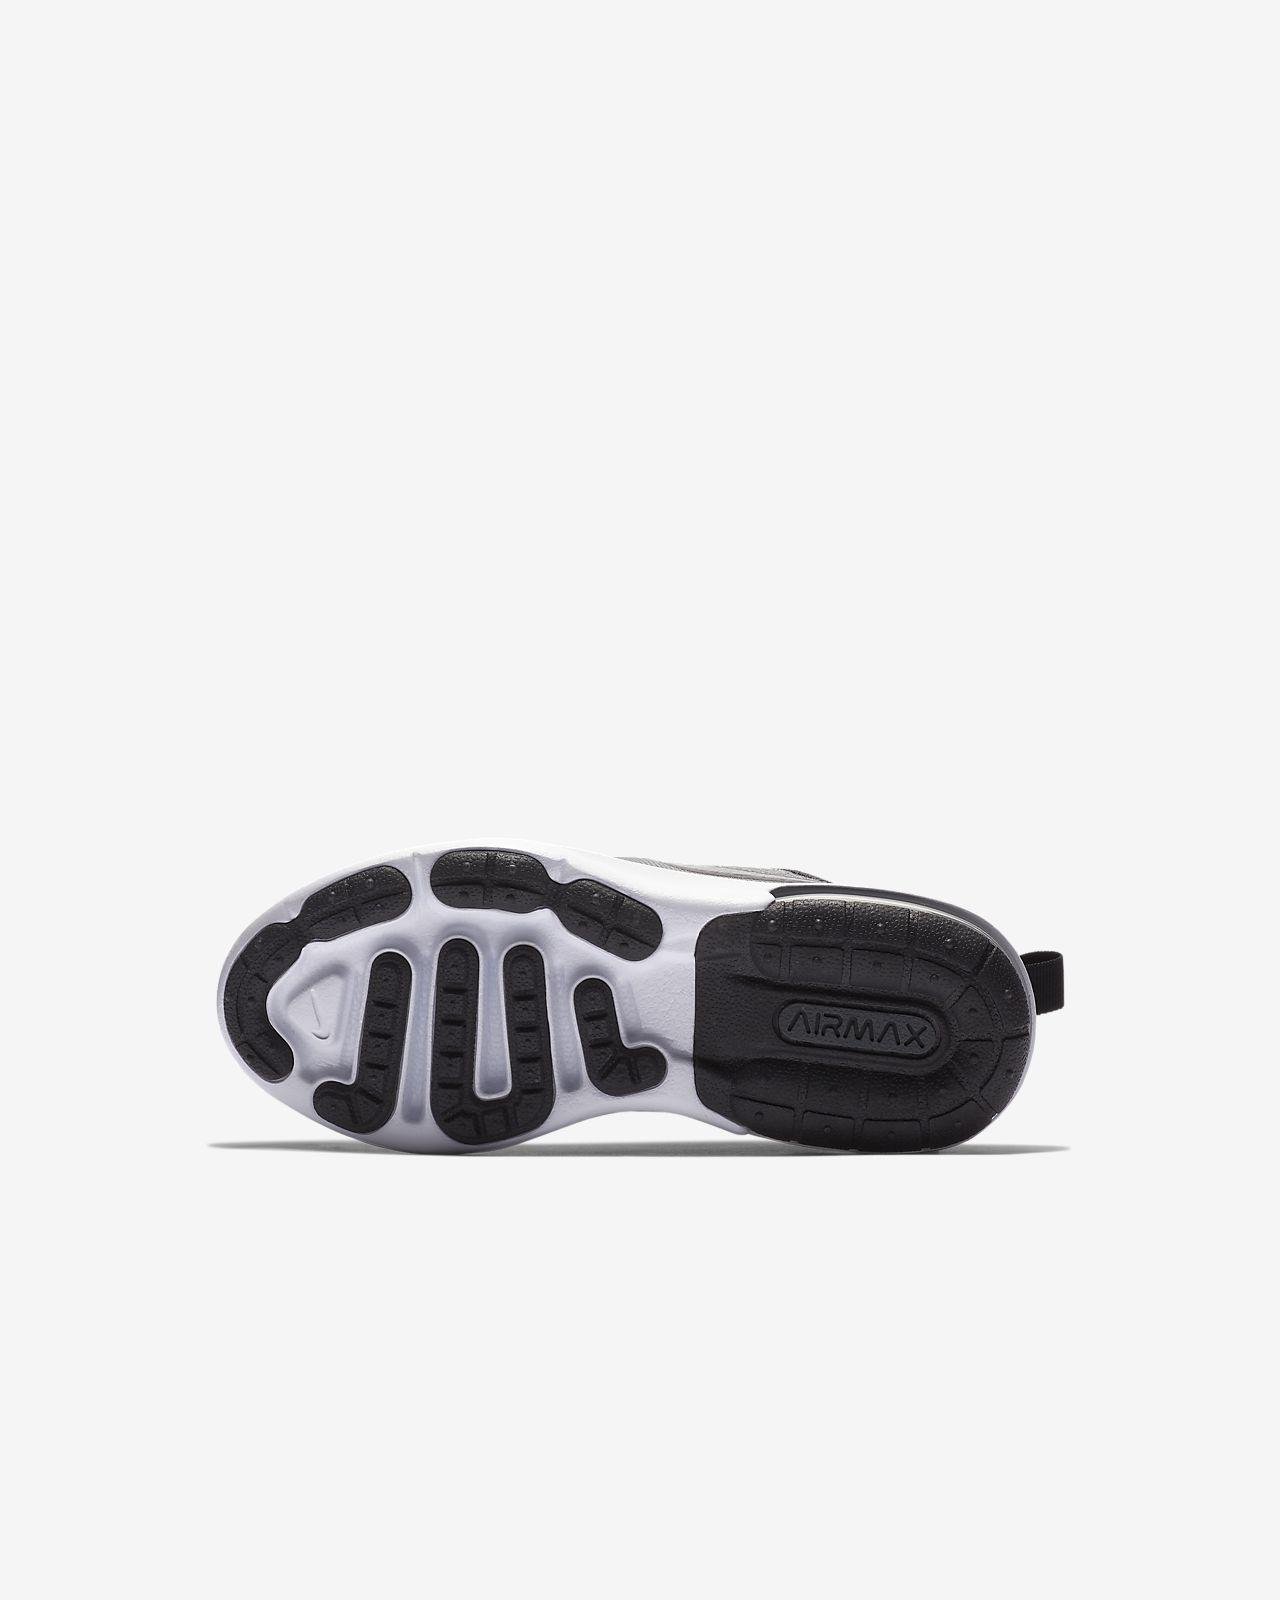 b0454ab3079 Nike Air Max Sequent 4 Schuh für jüngere Kinder. Nike.com DE